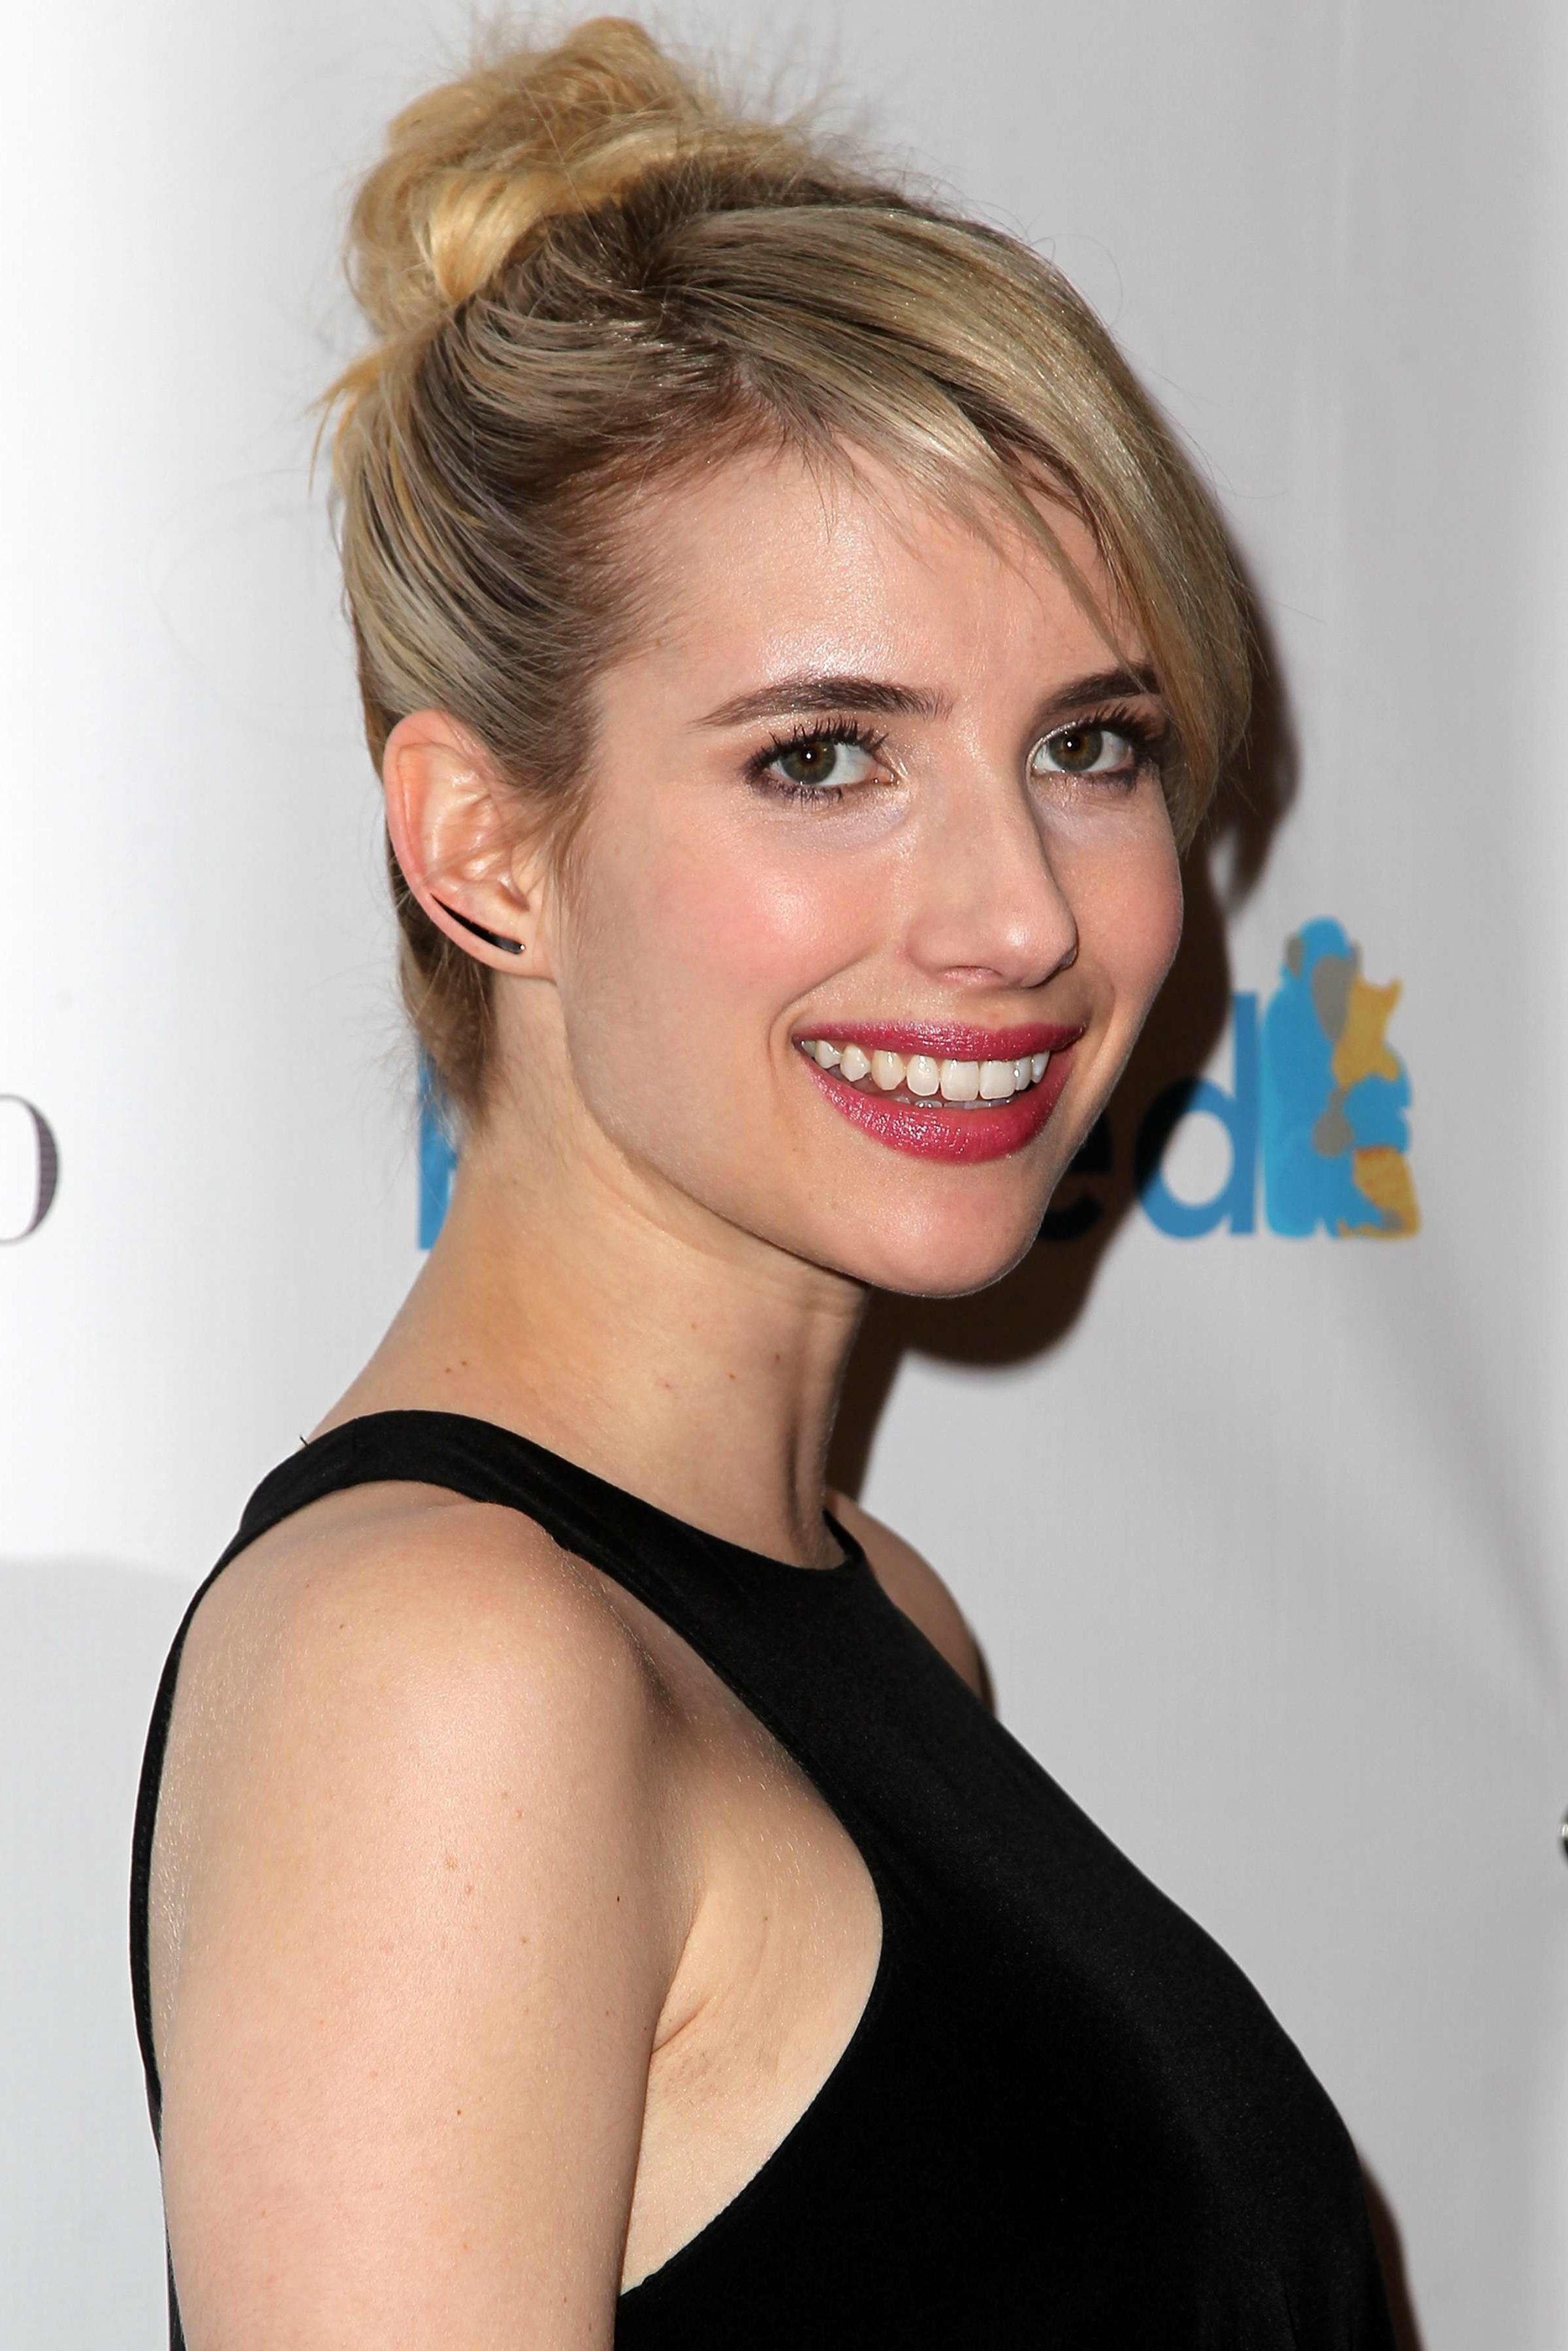 Emma Roberts Age, Net Worth, Movies, Bio & More Emma